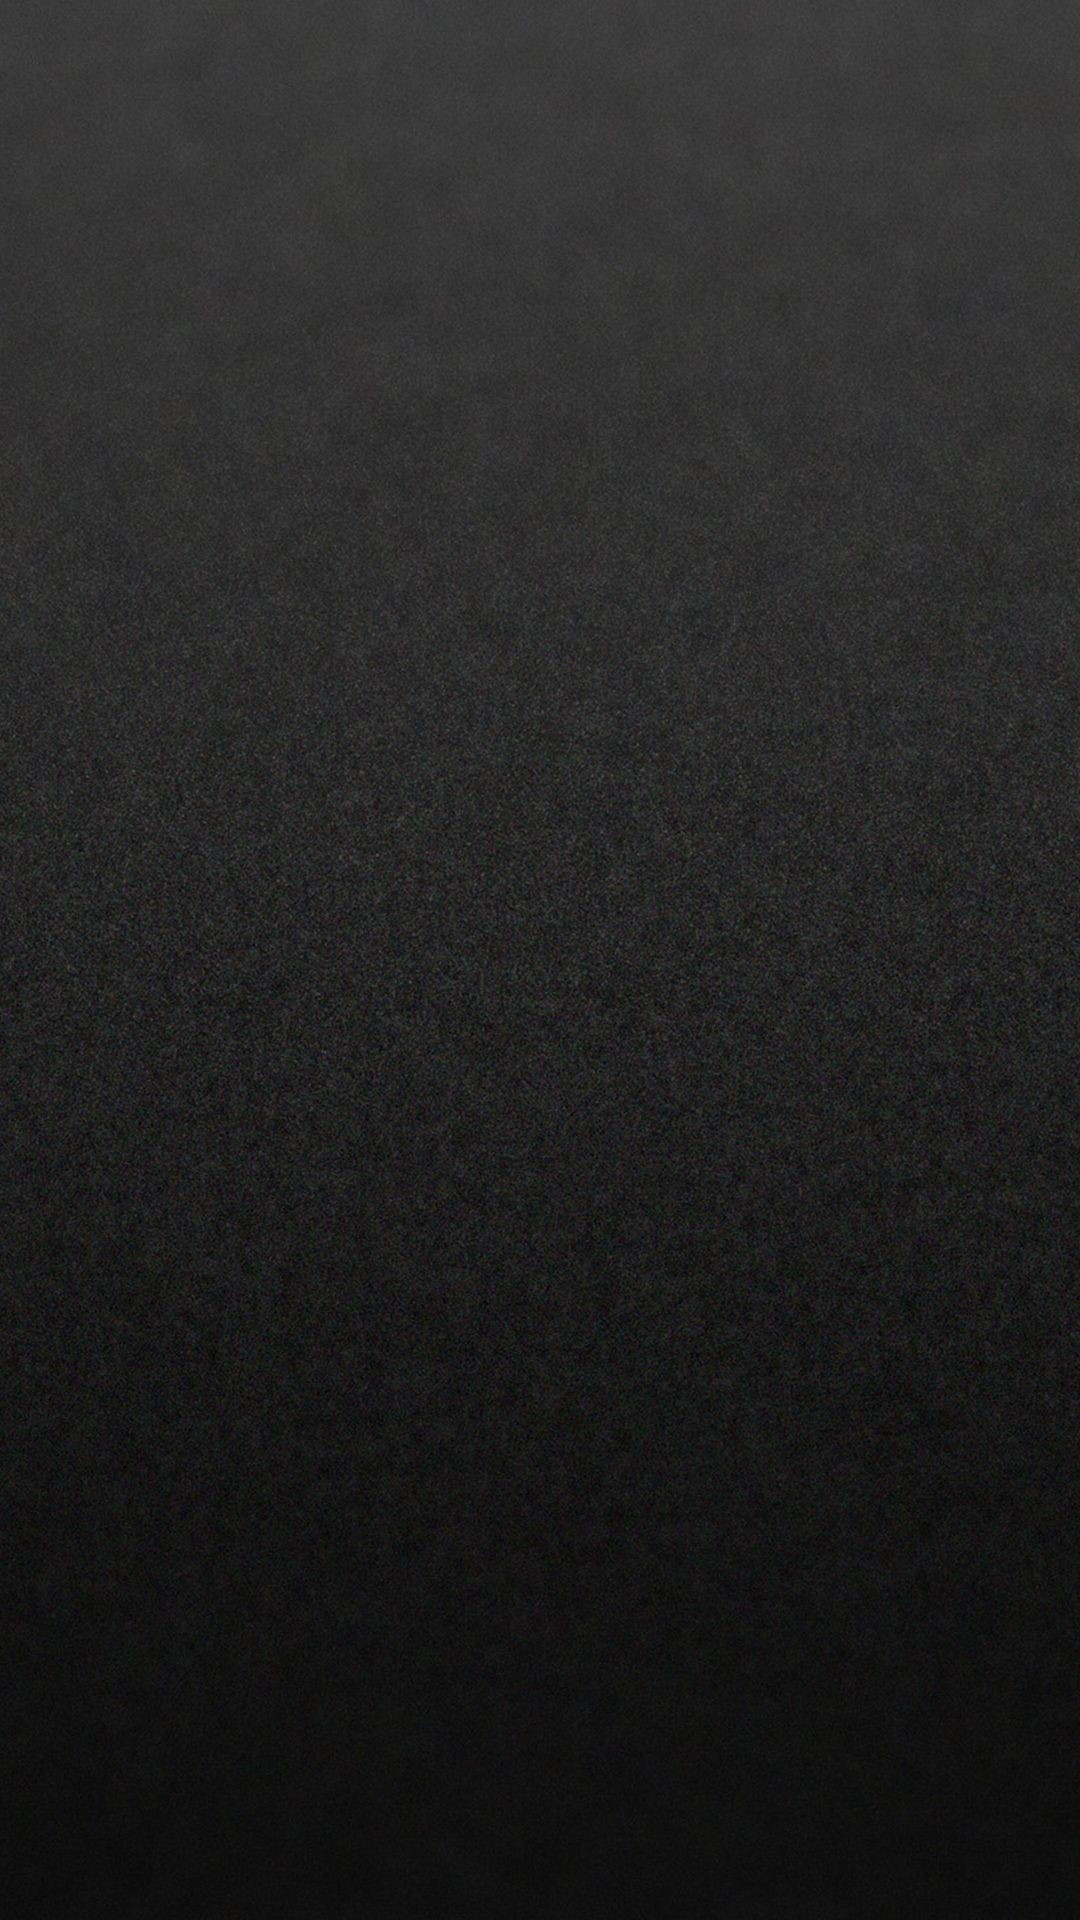 4k Carbon Fiber Wallpaper 71 Images